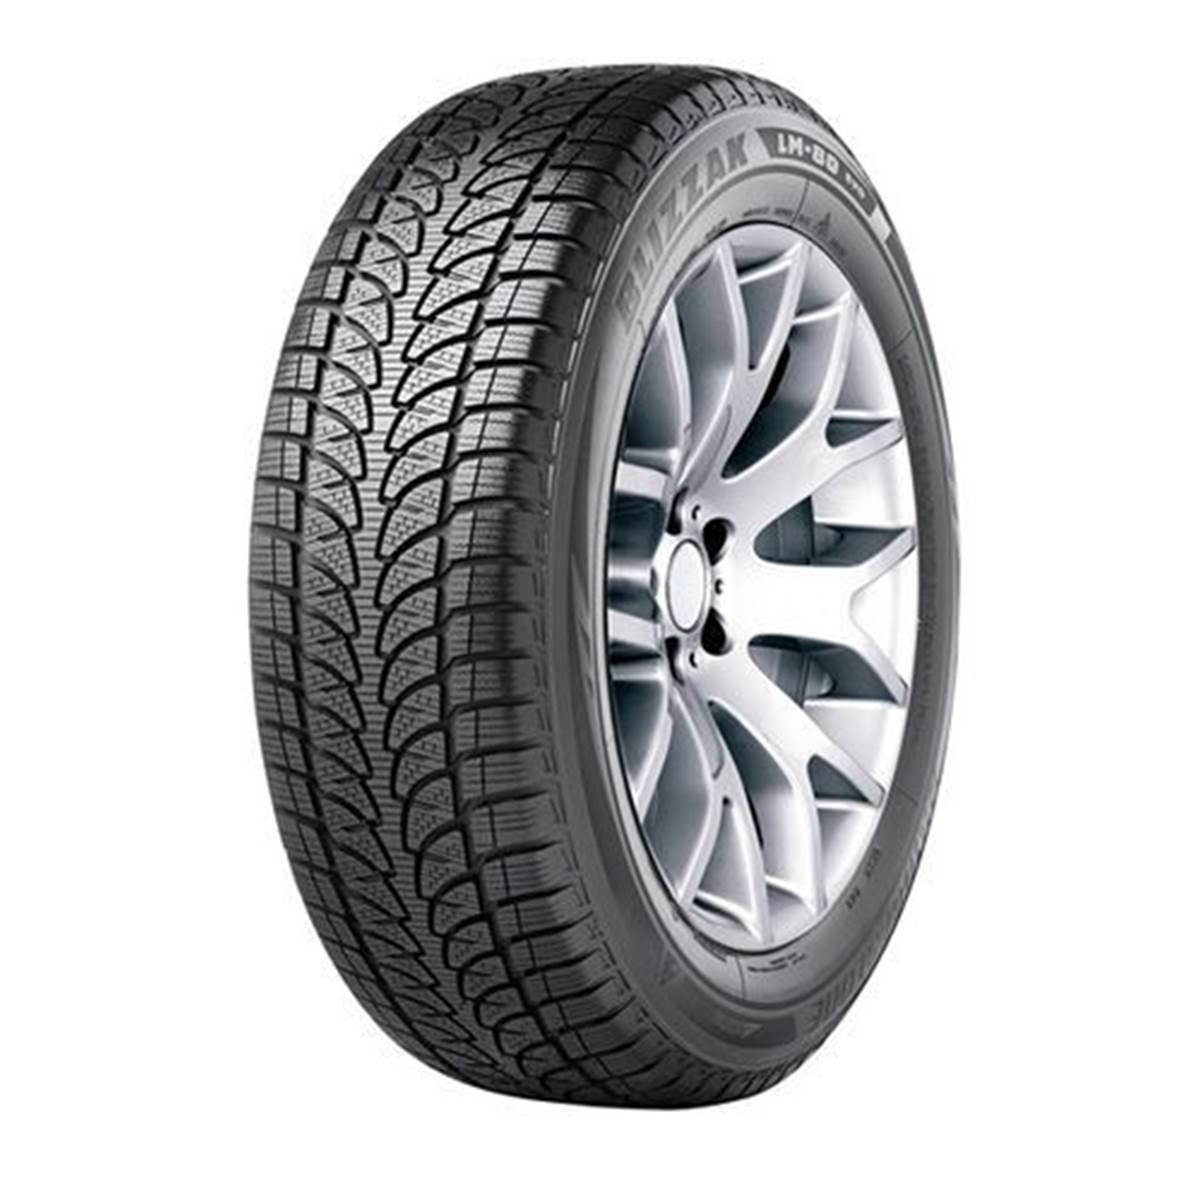 Pneu 4X4 Hiver Bridgestone 215/65R16 98H Blizzak Lm80